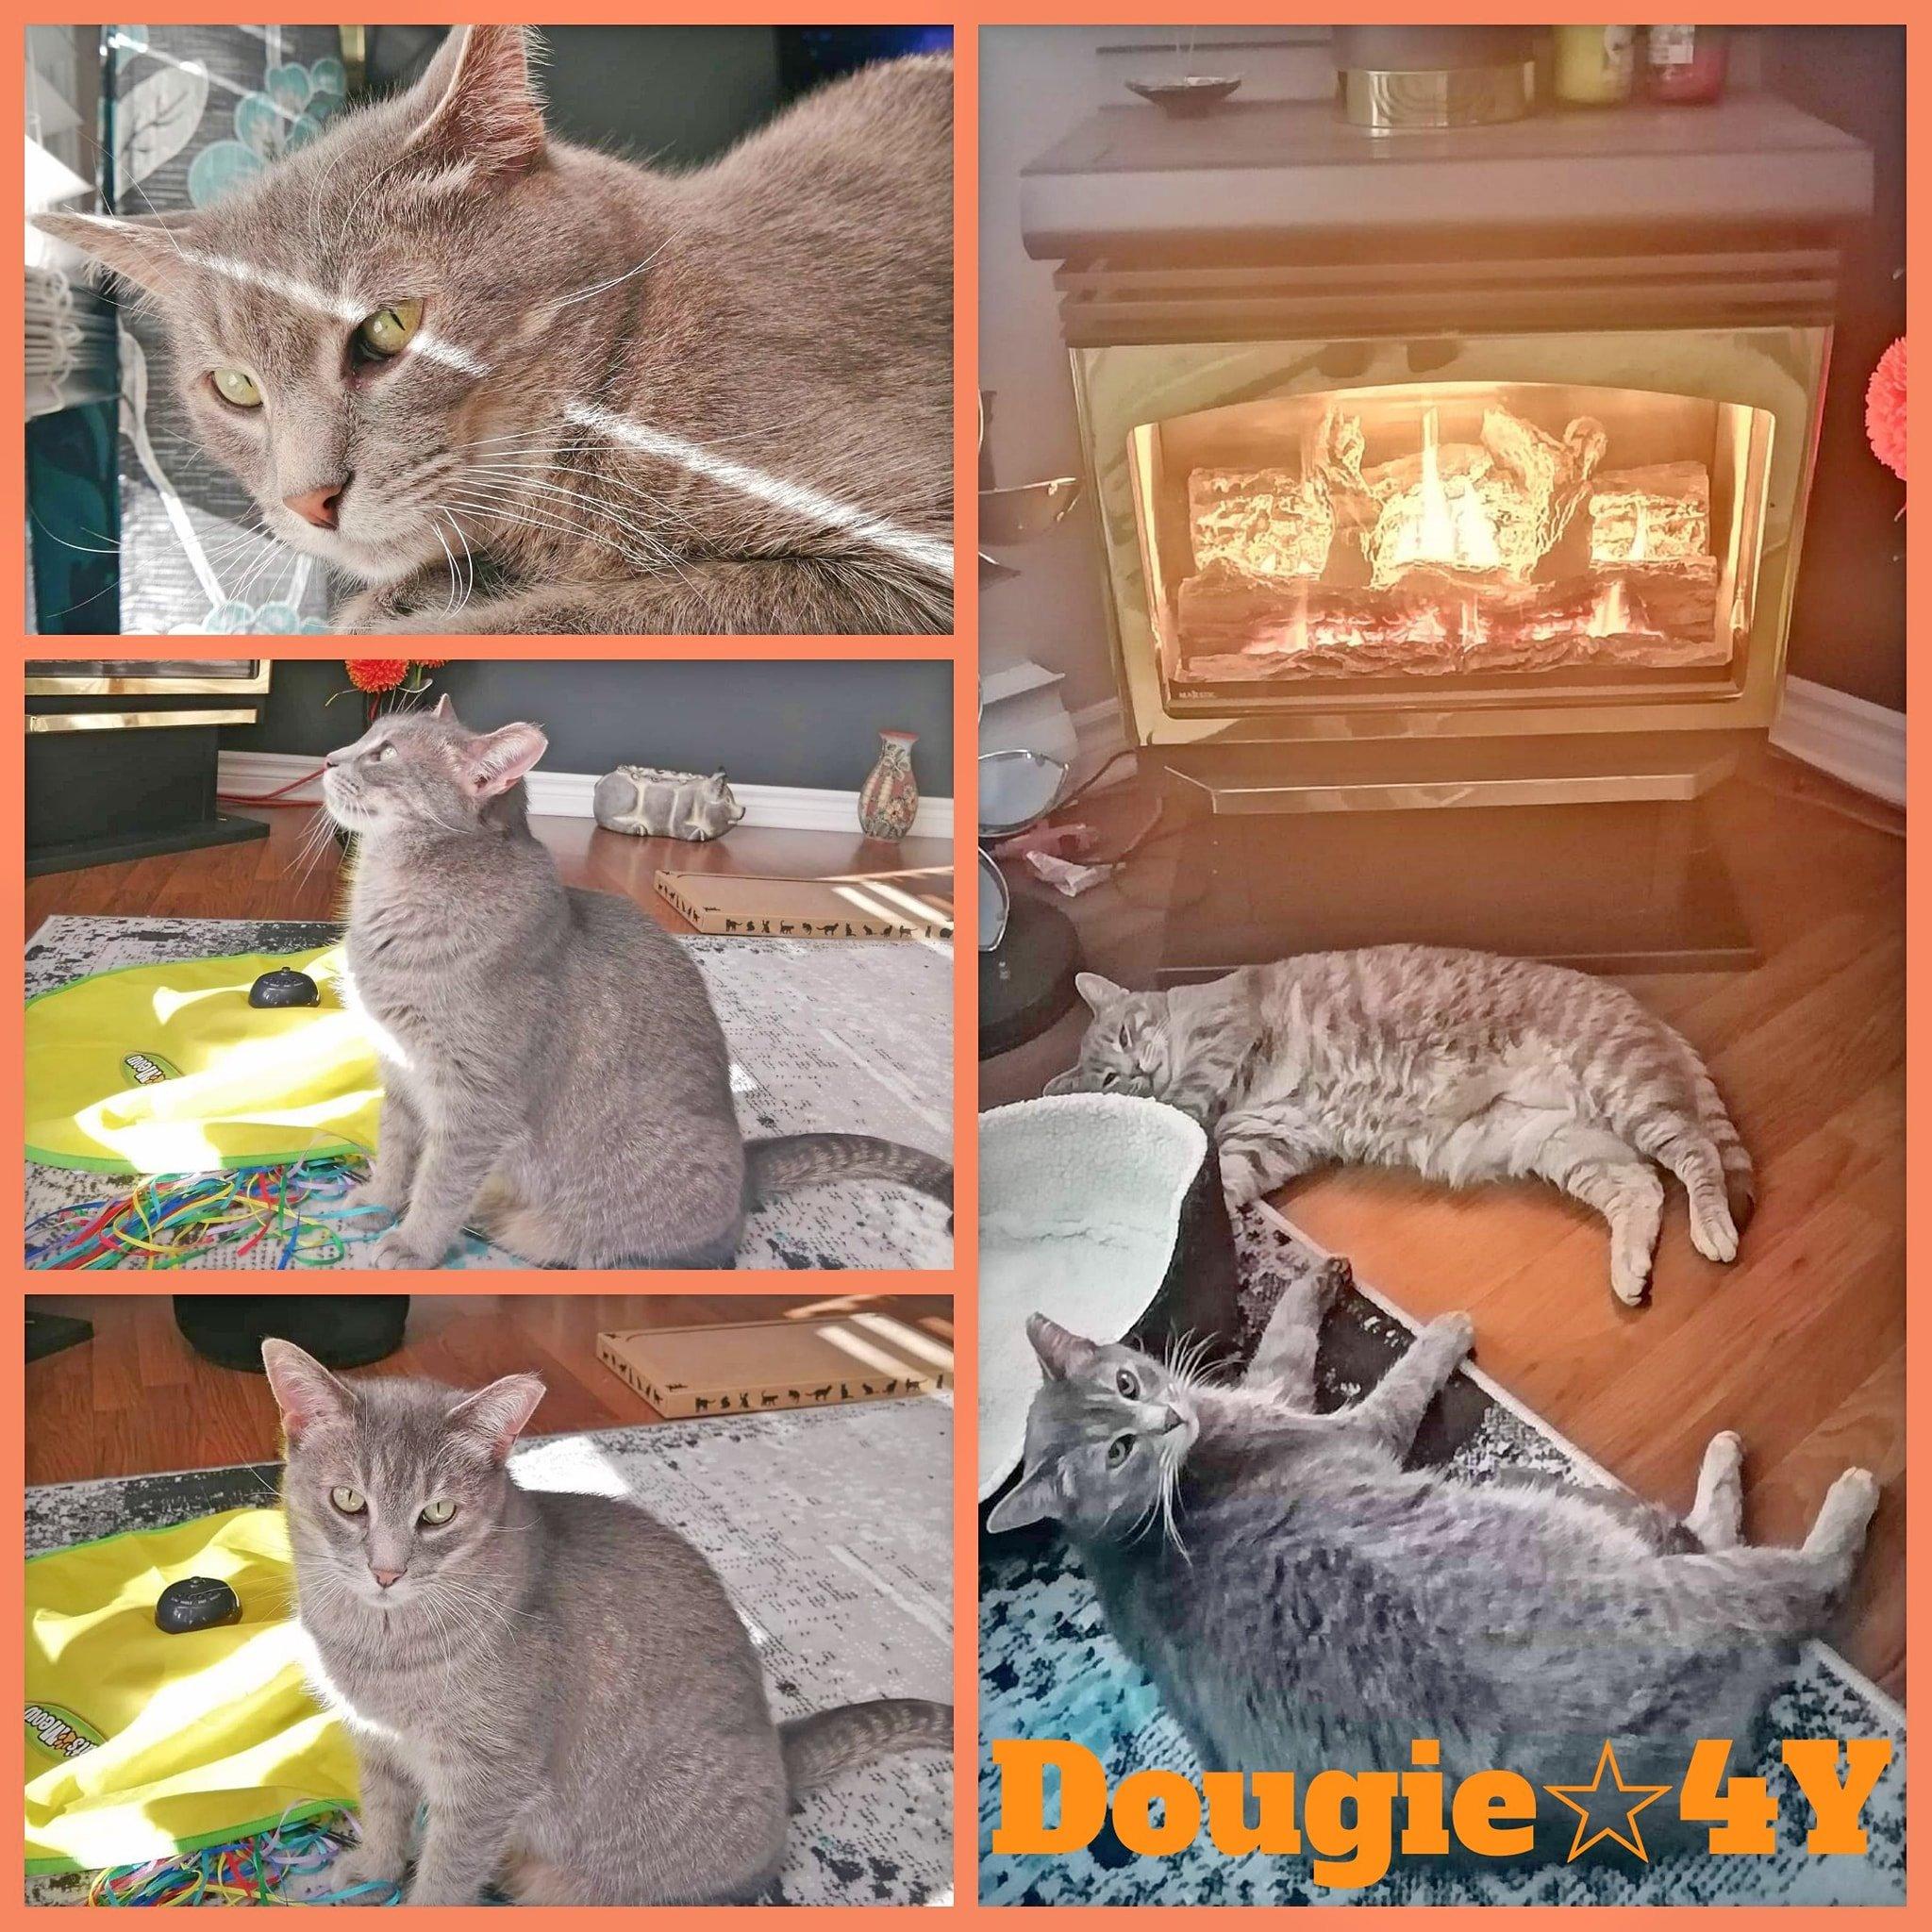 Dougie-Male-4 Years